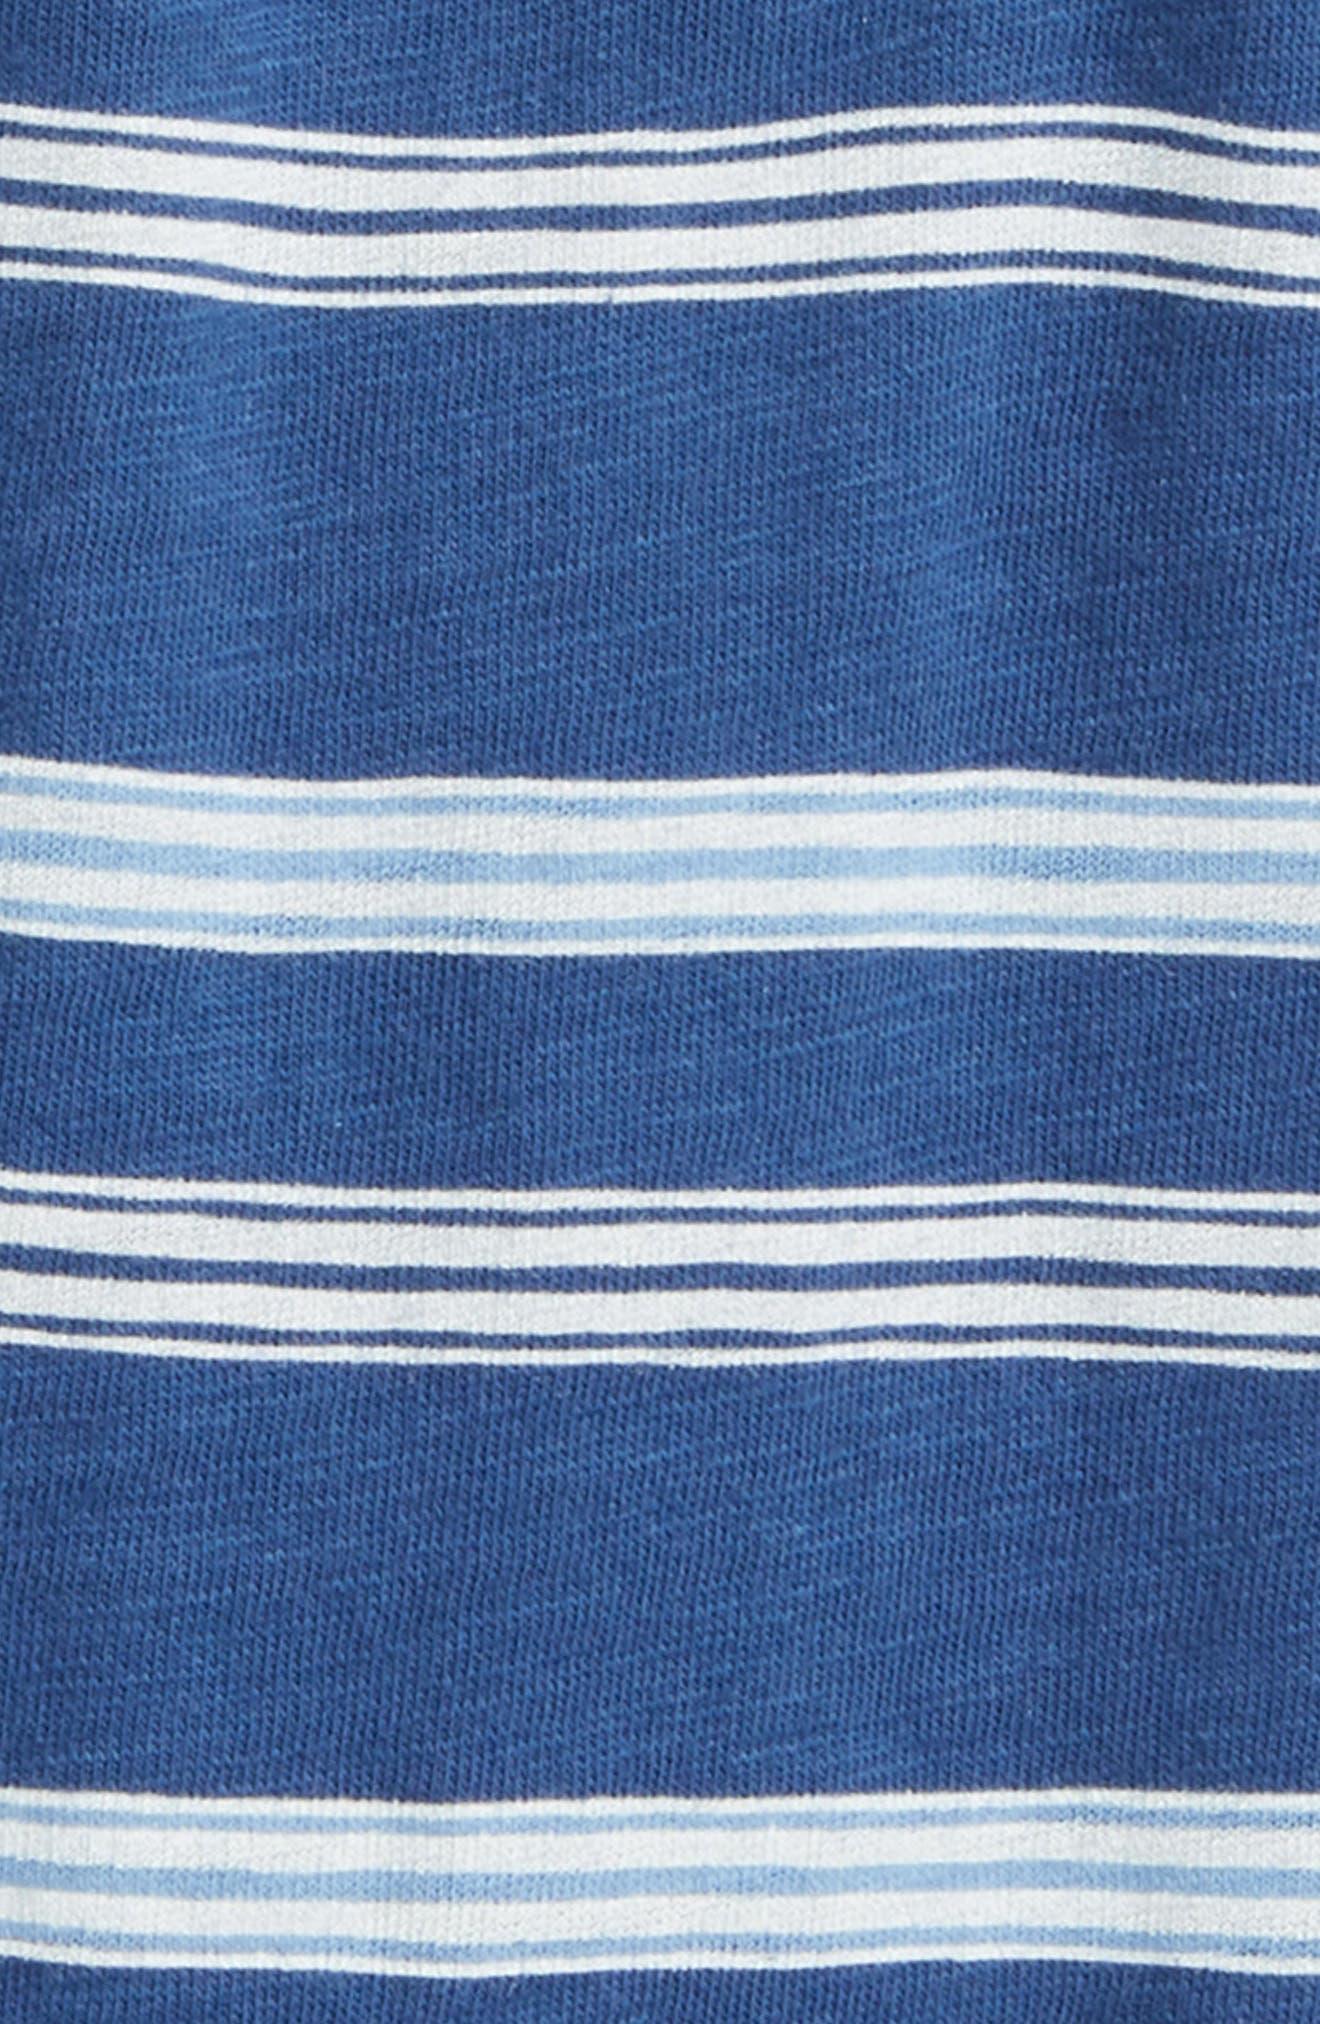 Peek Kaylan Stripe Pants,                             Alternate thumbnail 2, color,                             Blue